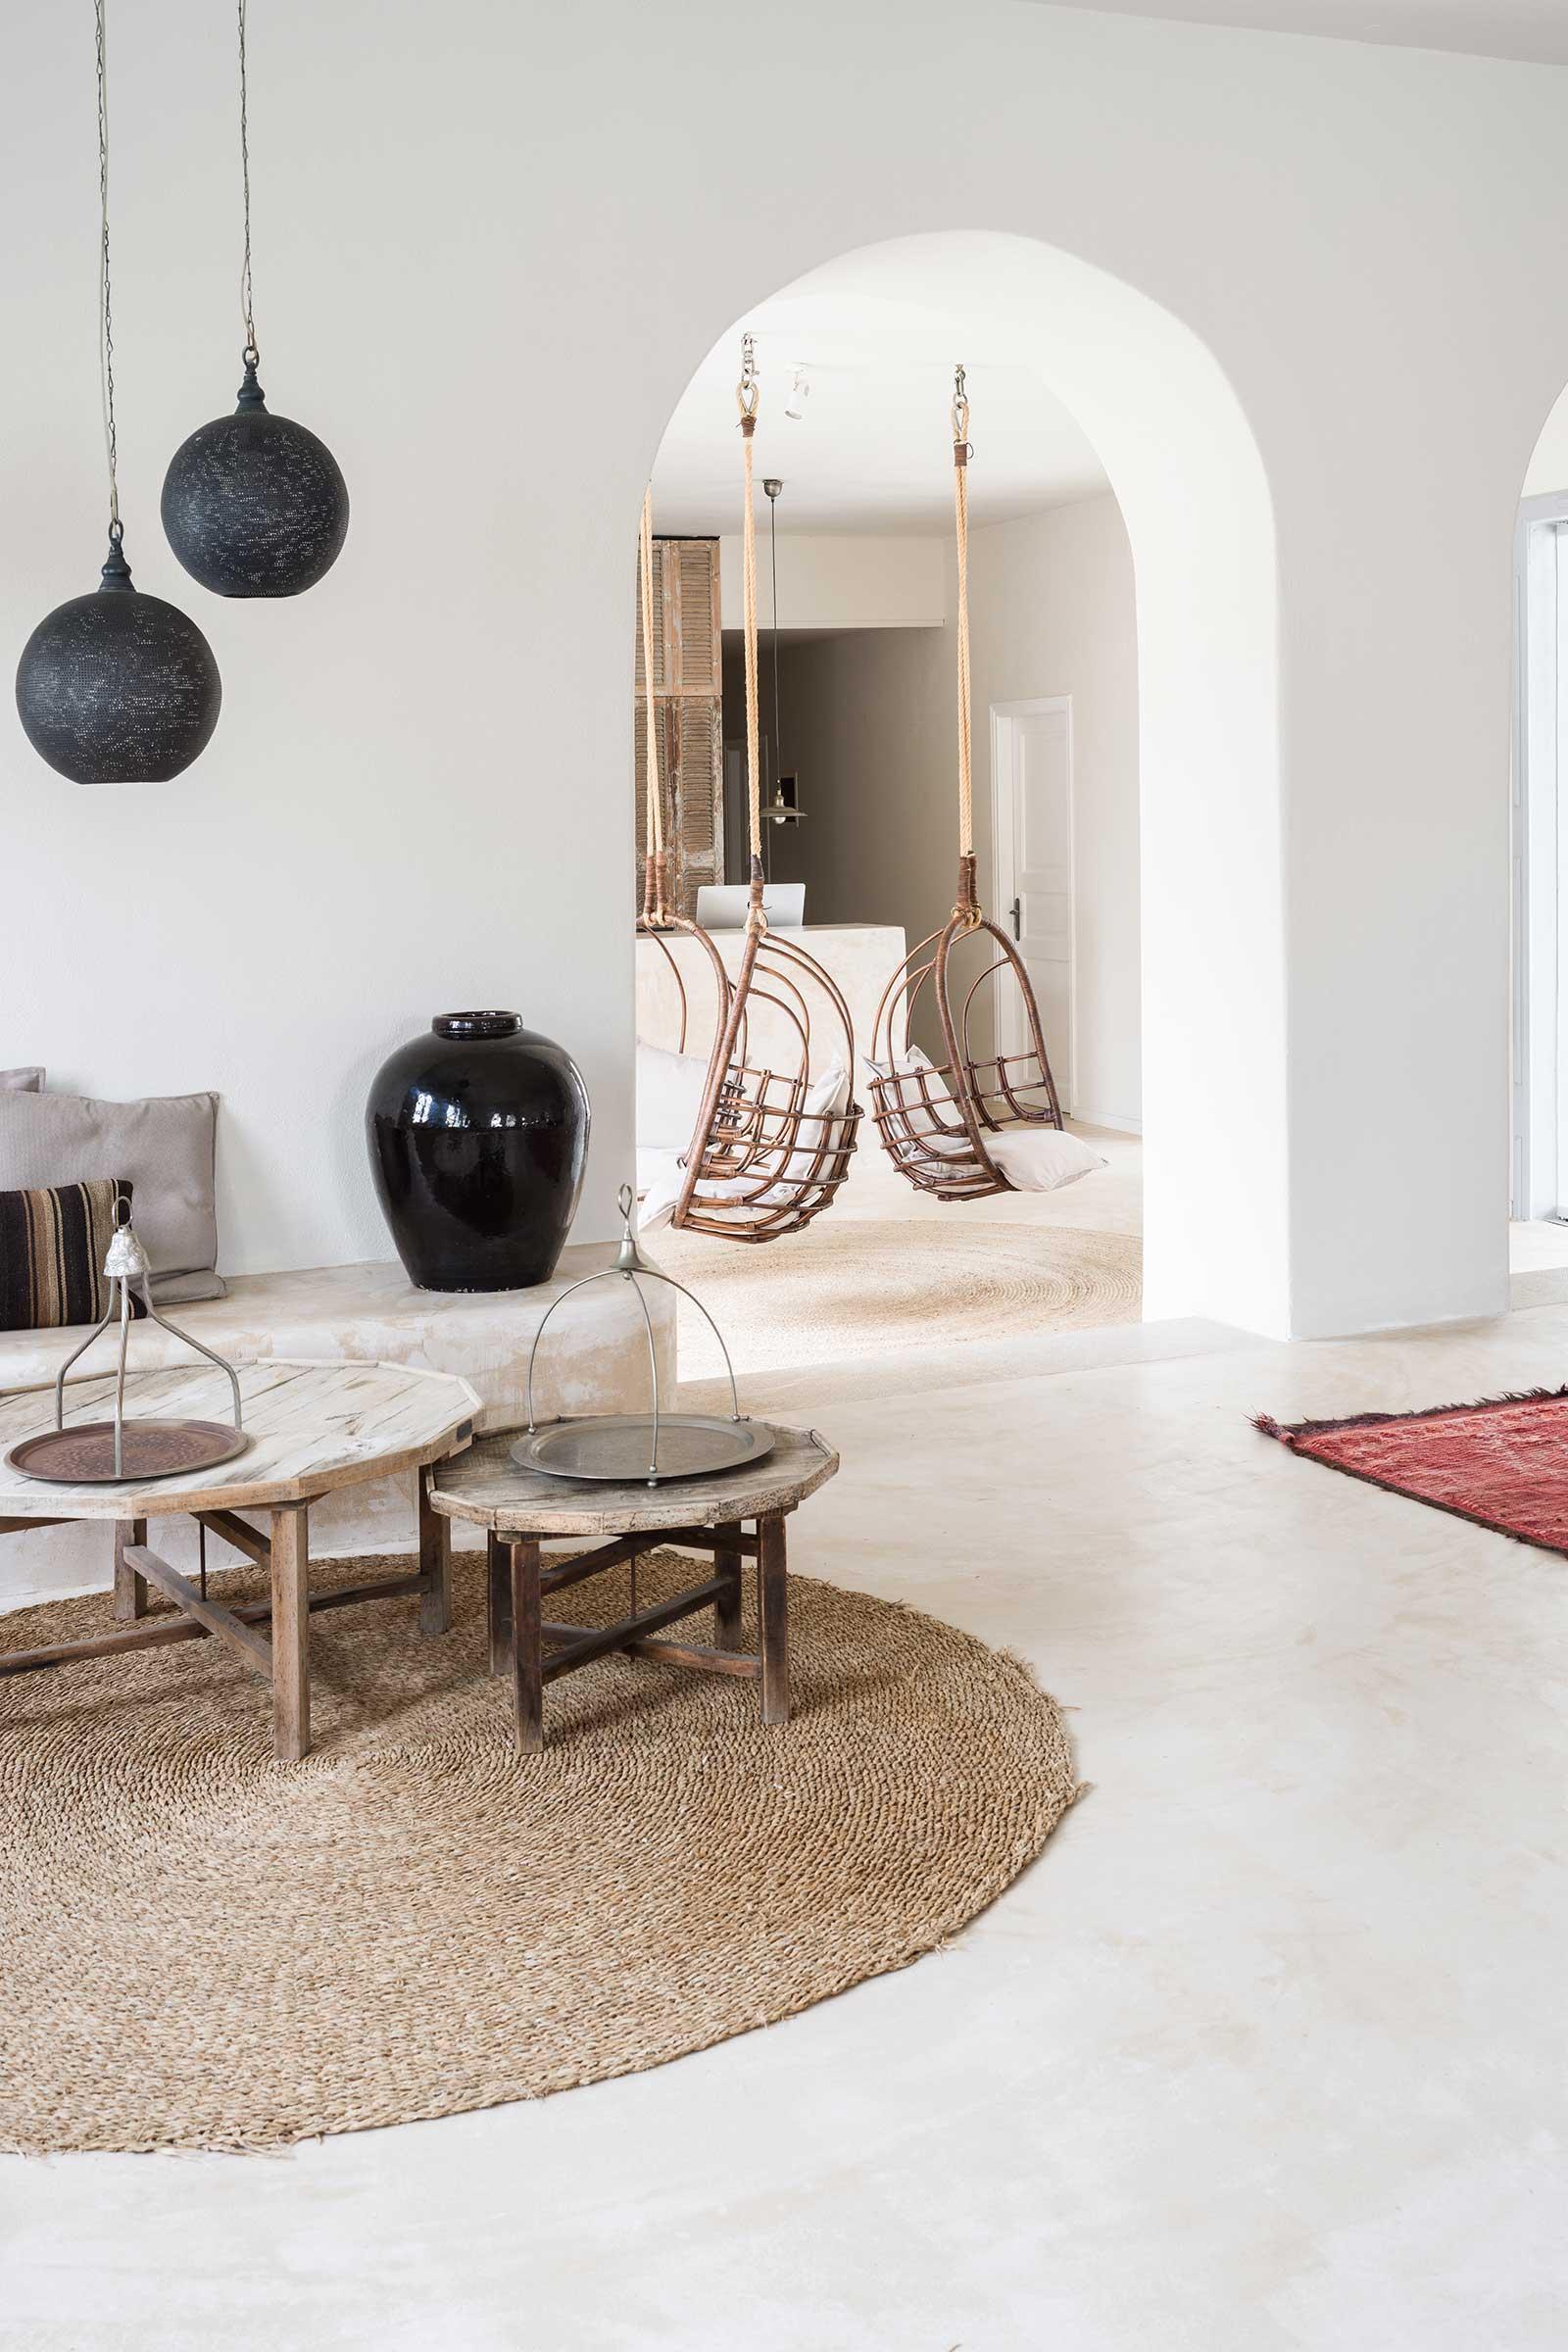 San Giorgio. Image courtesy of Design Hotels™